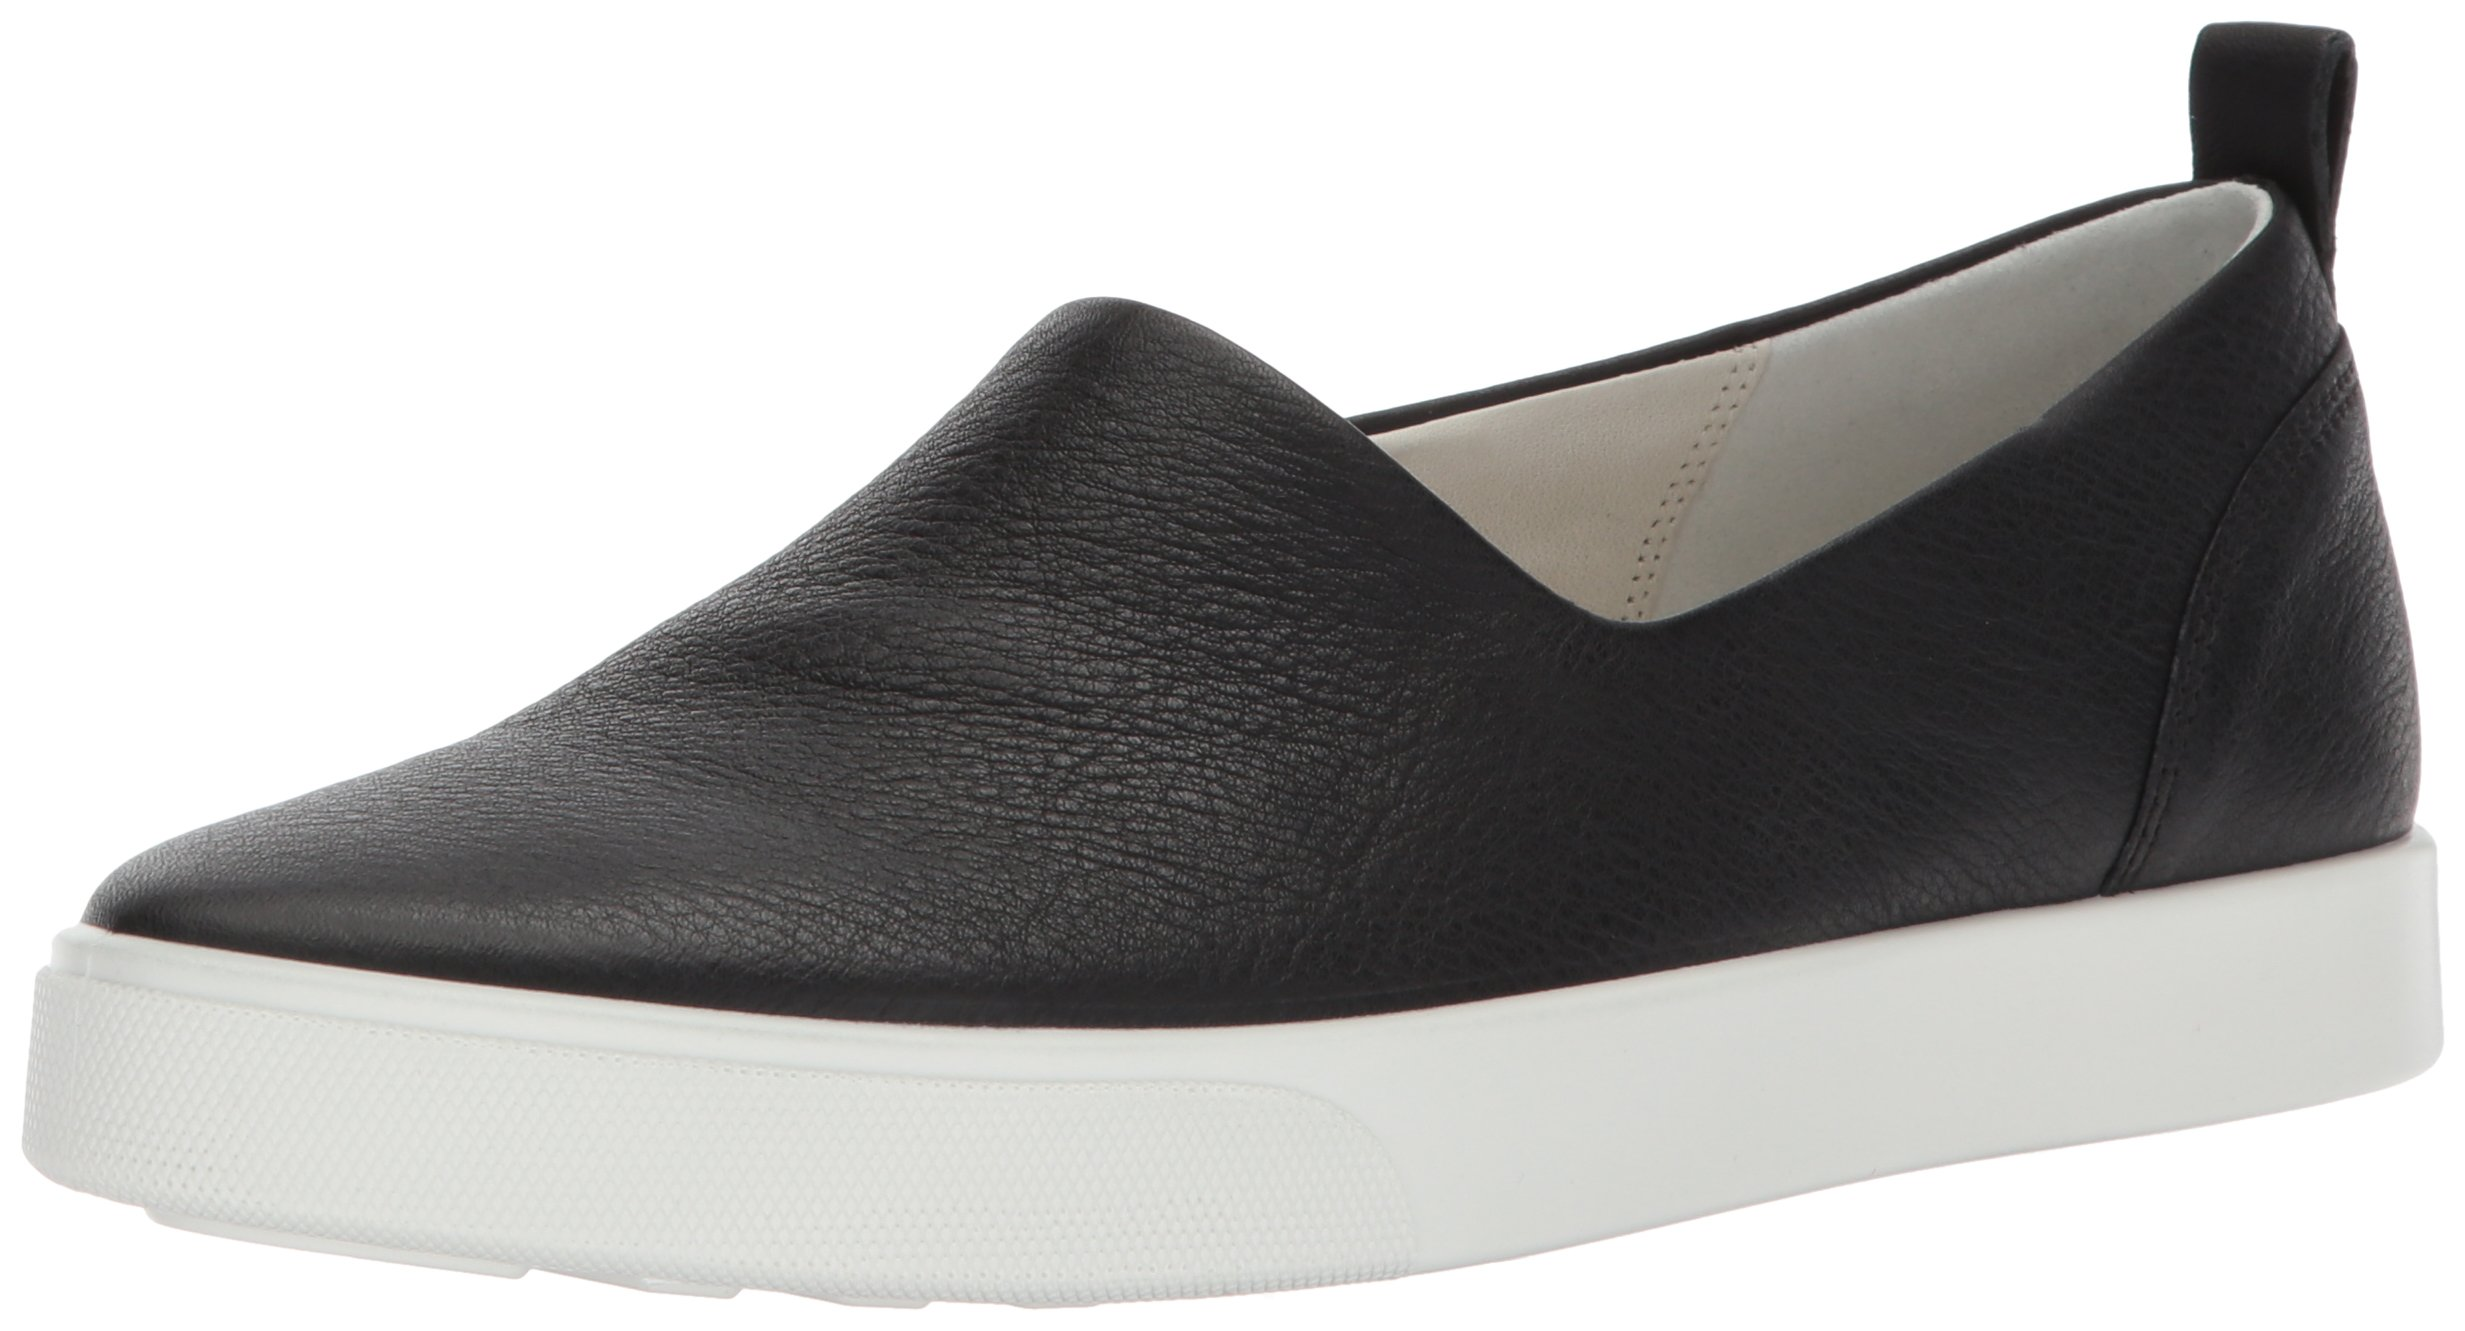 ECCOエスプレッソジリアンファッション怠惰な靴